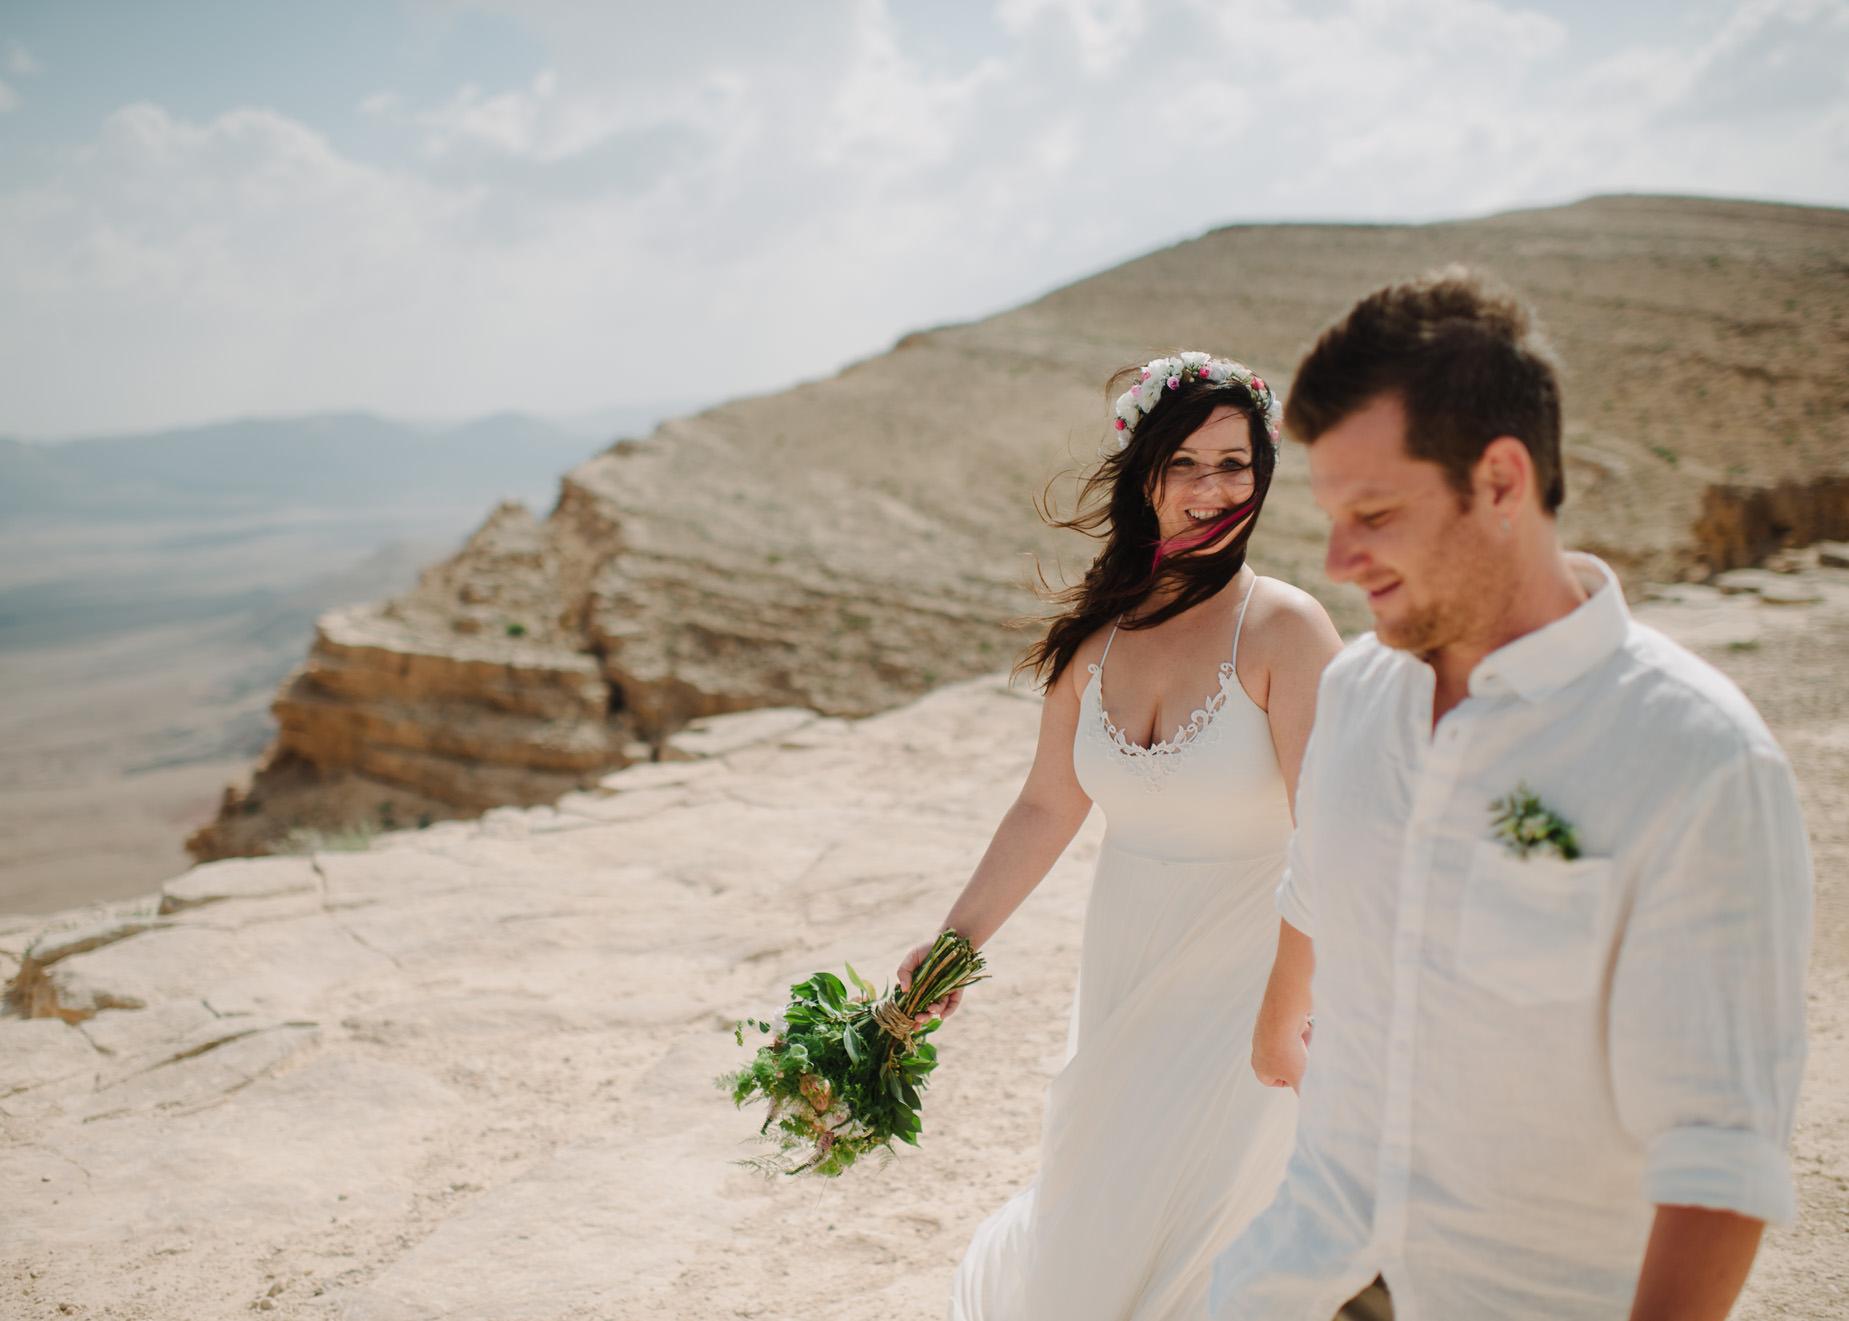 couple in desert portrait